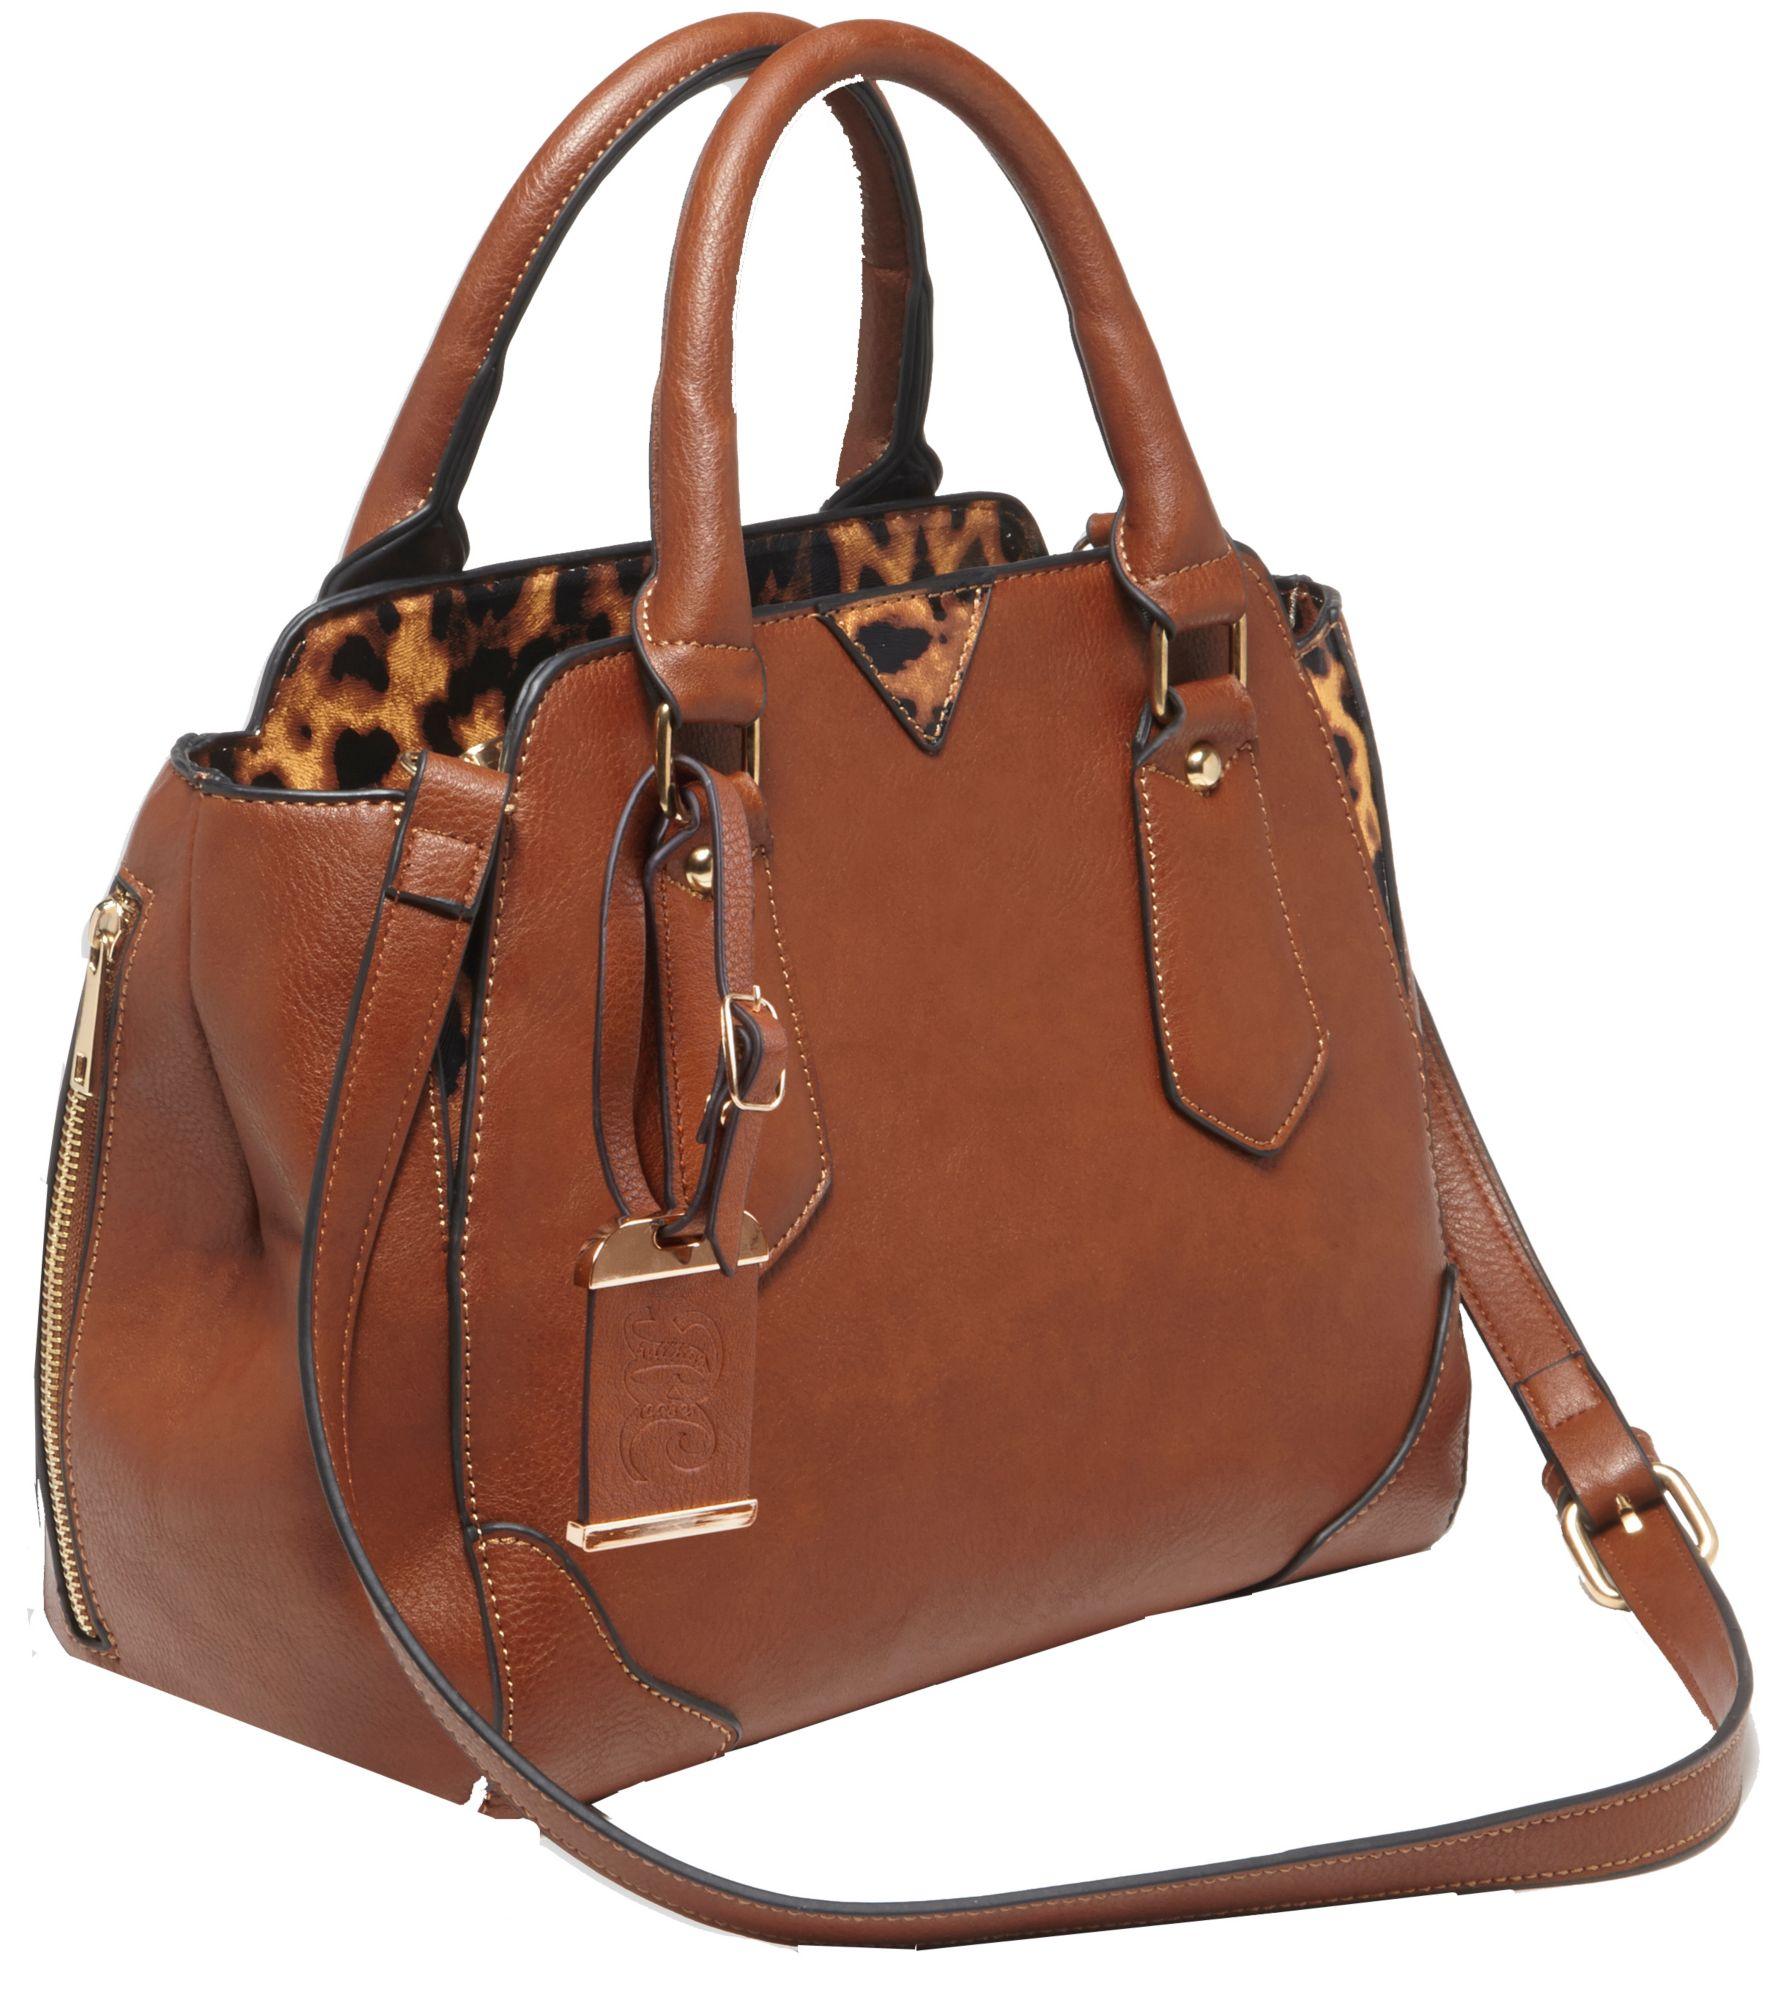 Bulldog Cases Satchel Style Concealed Carry Handbag, Women's, Size: Medium, Brown thumbnail